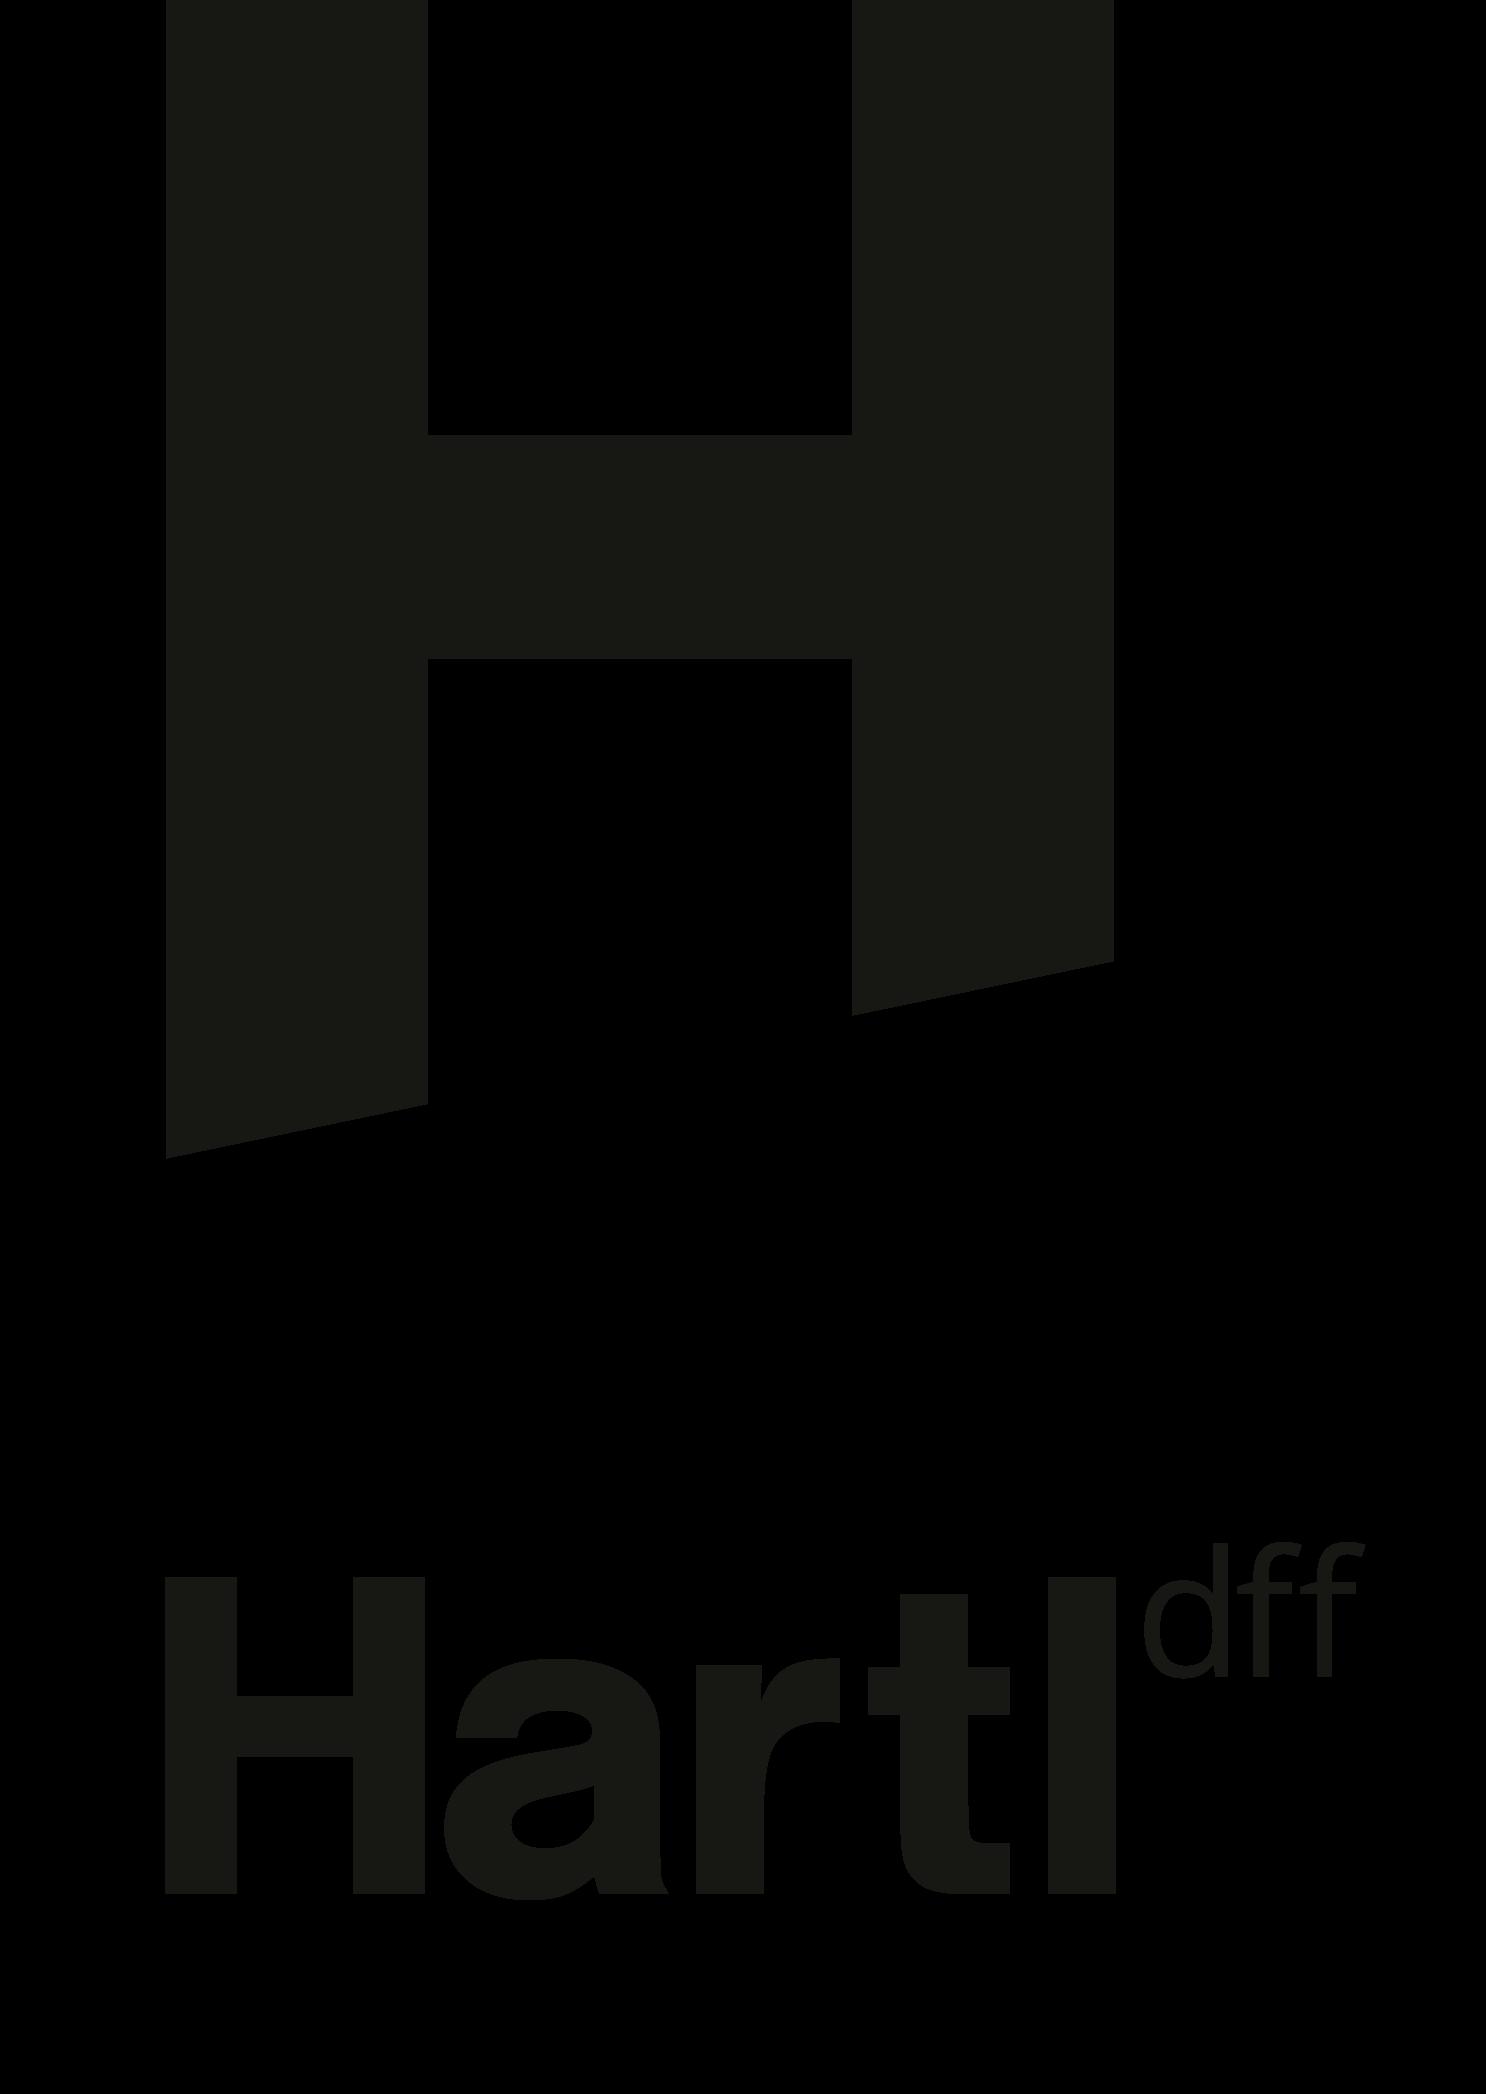 Michael Hartl